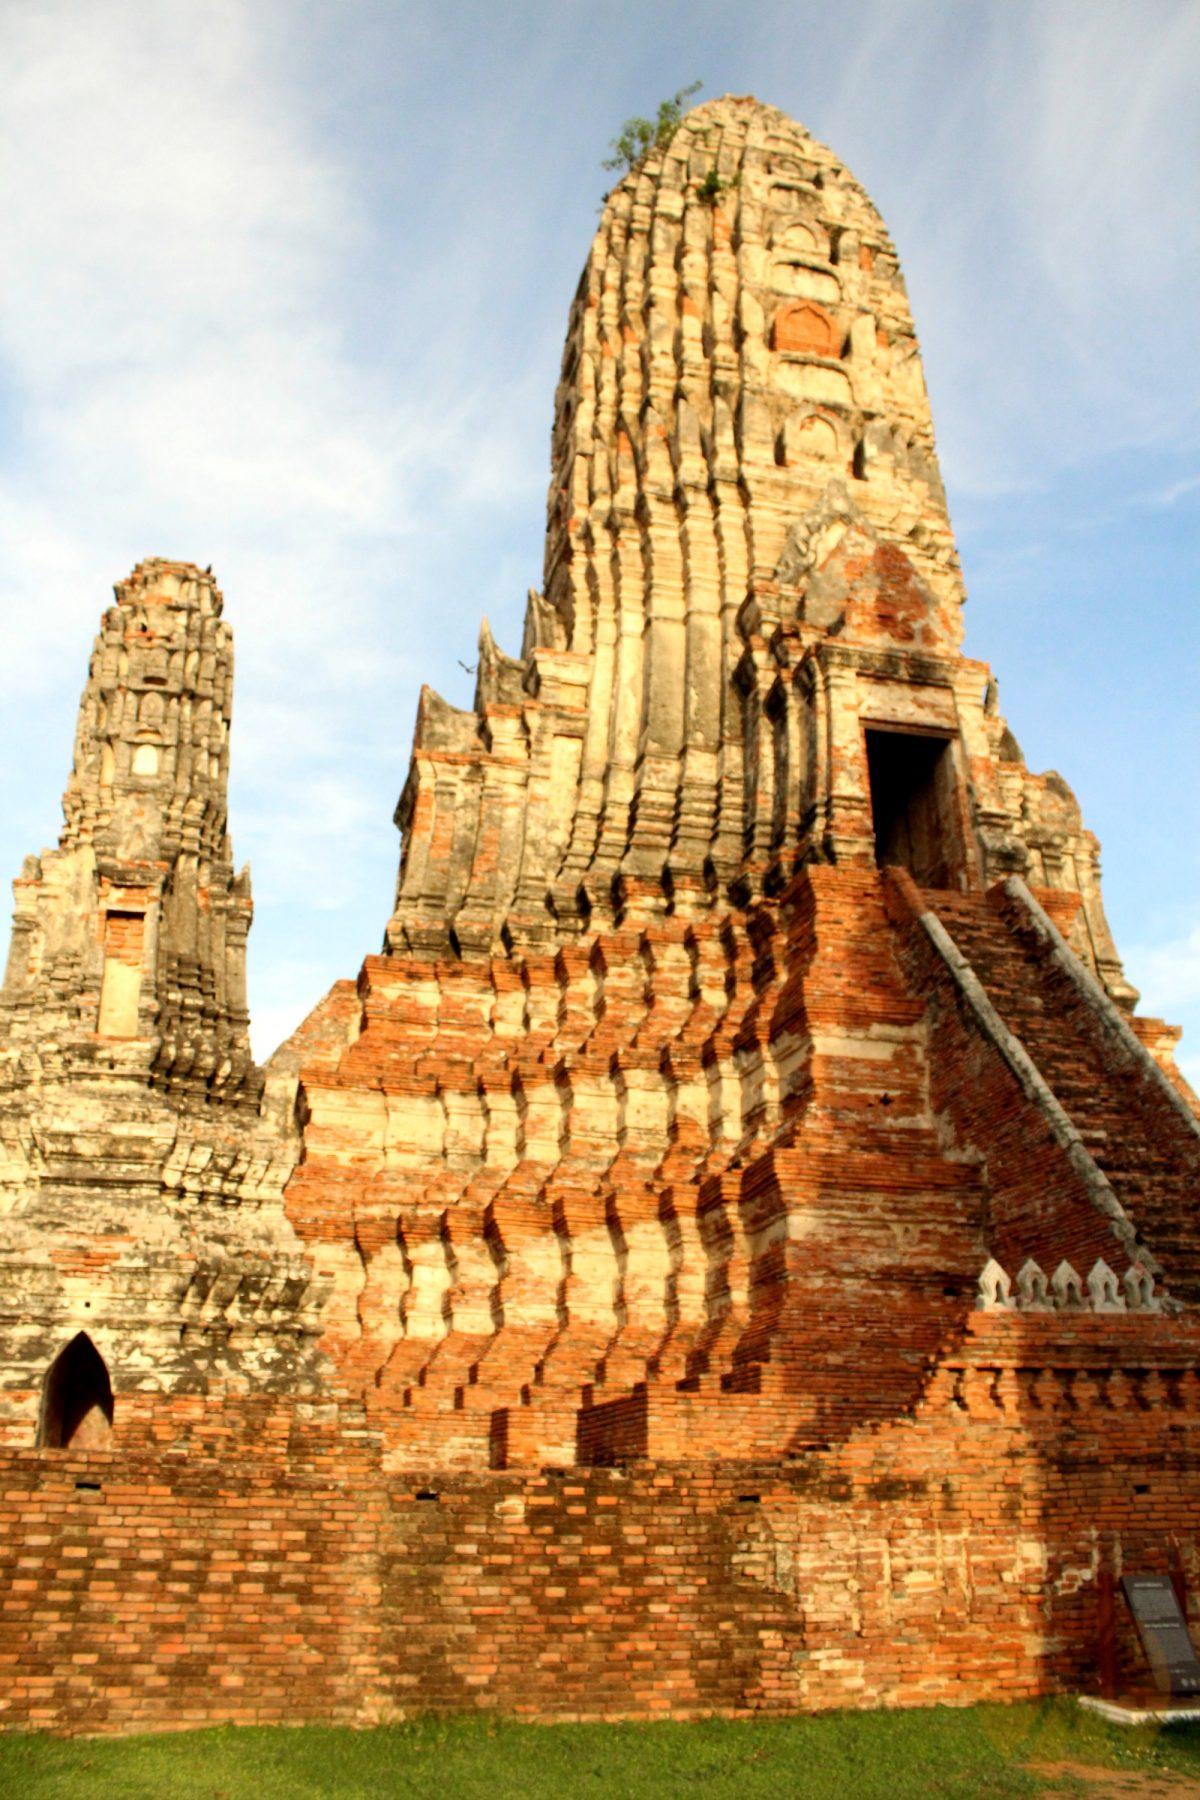 Sunlight on Wat Chai Watthanaram